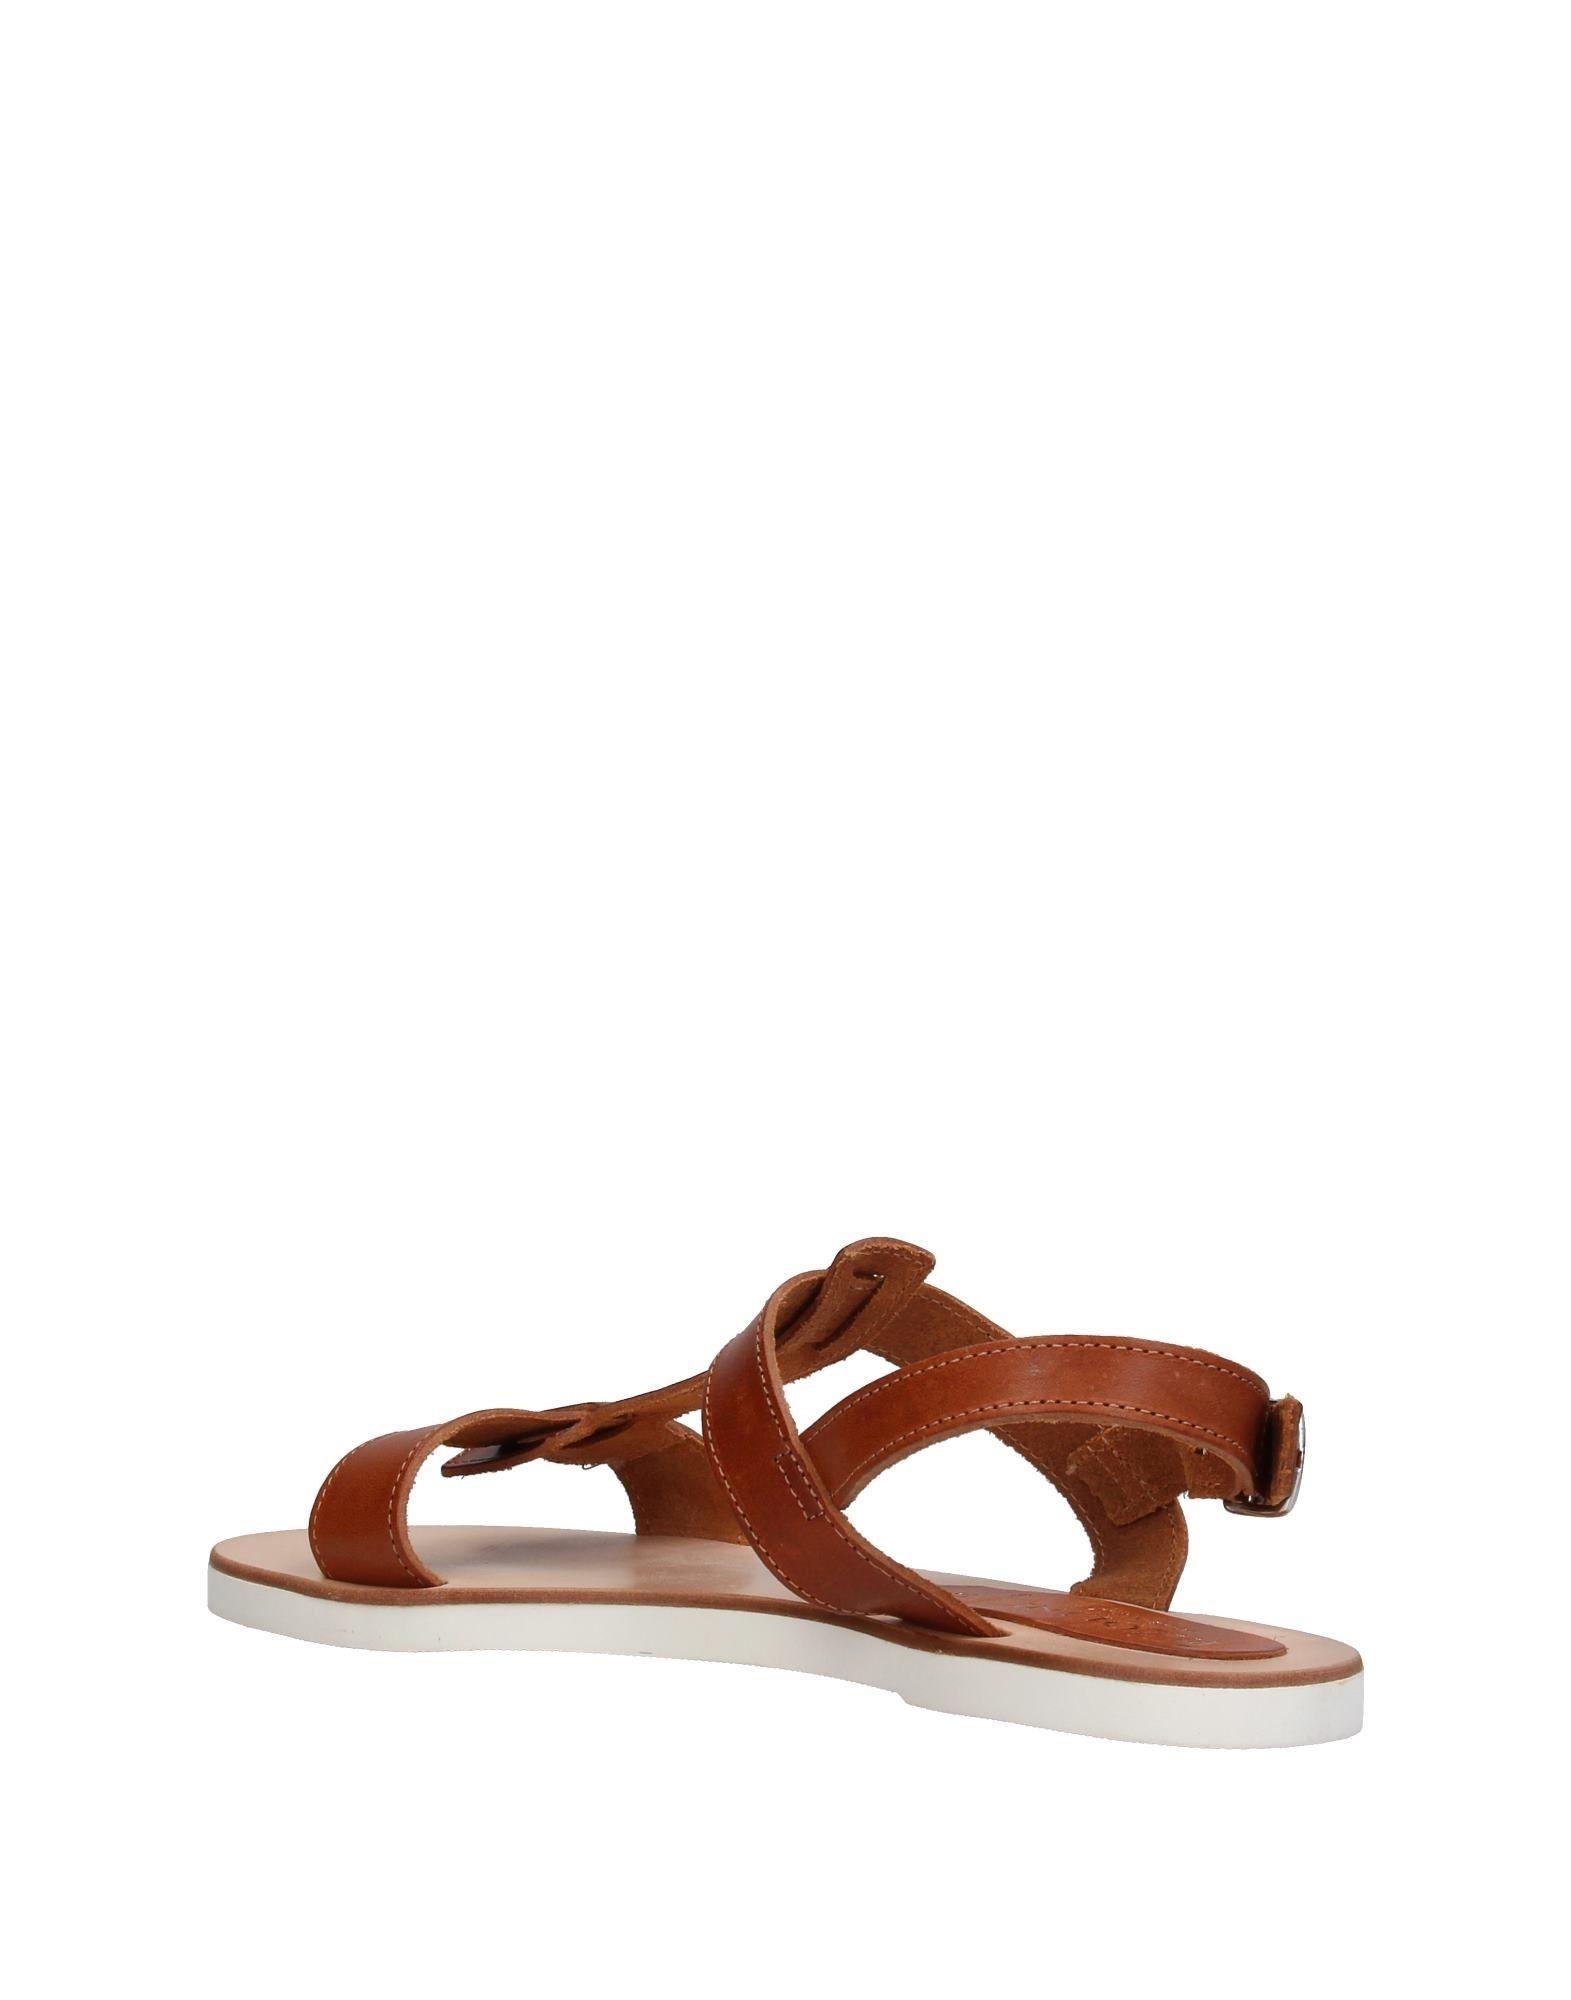 Carlo Pazolini Brown Leather Sandals